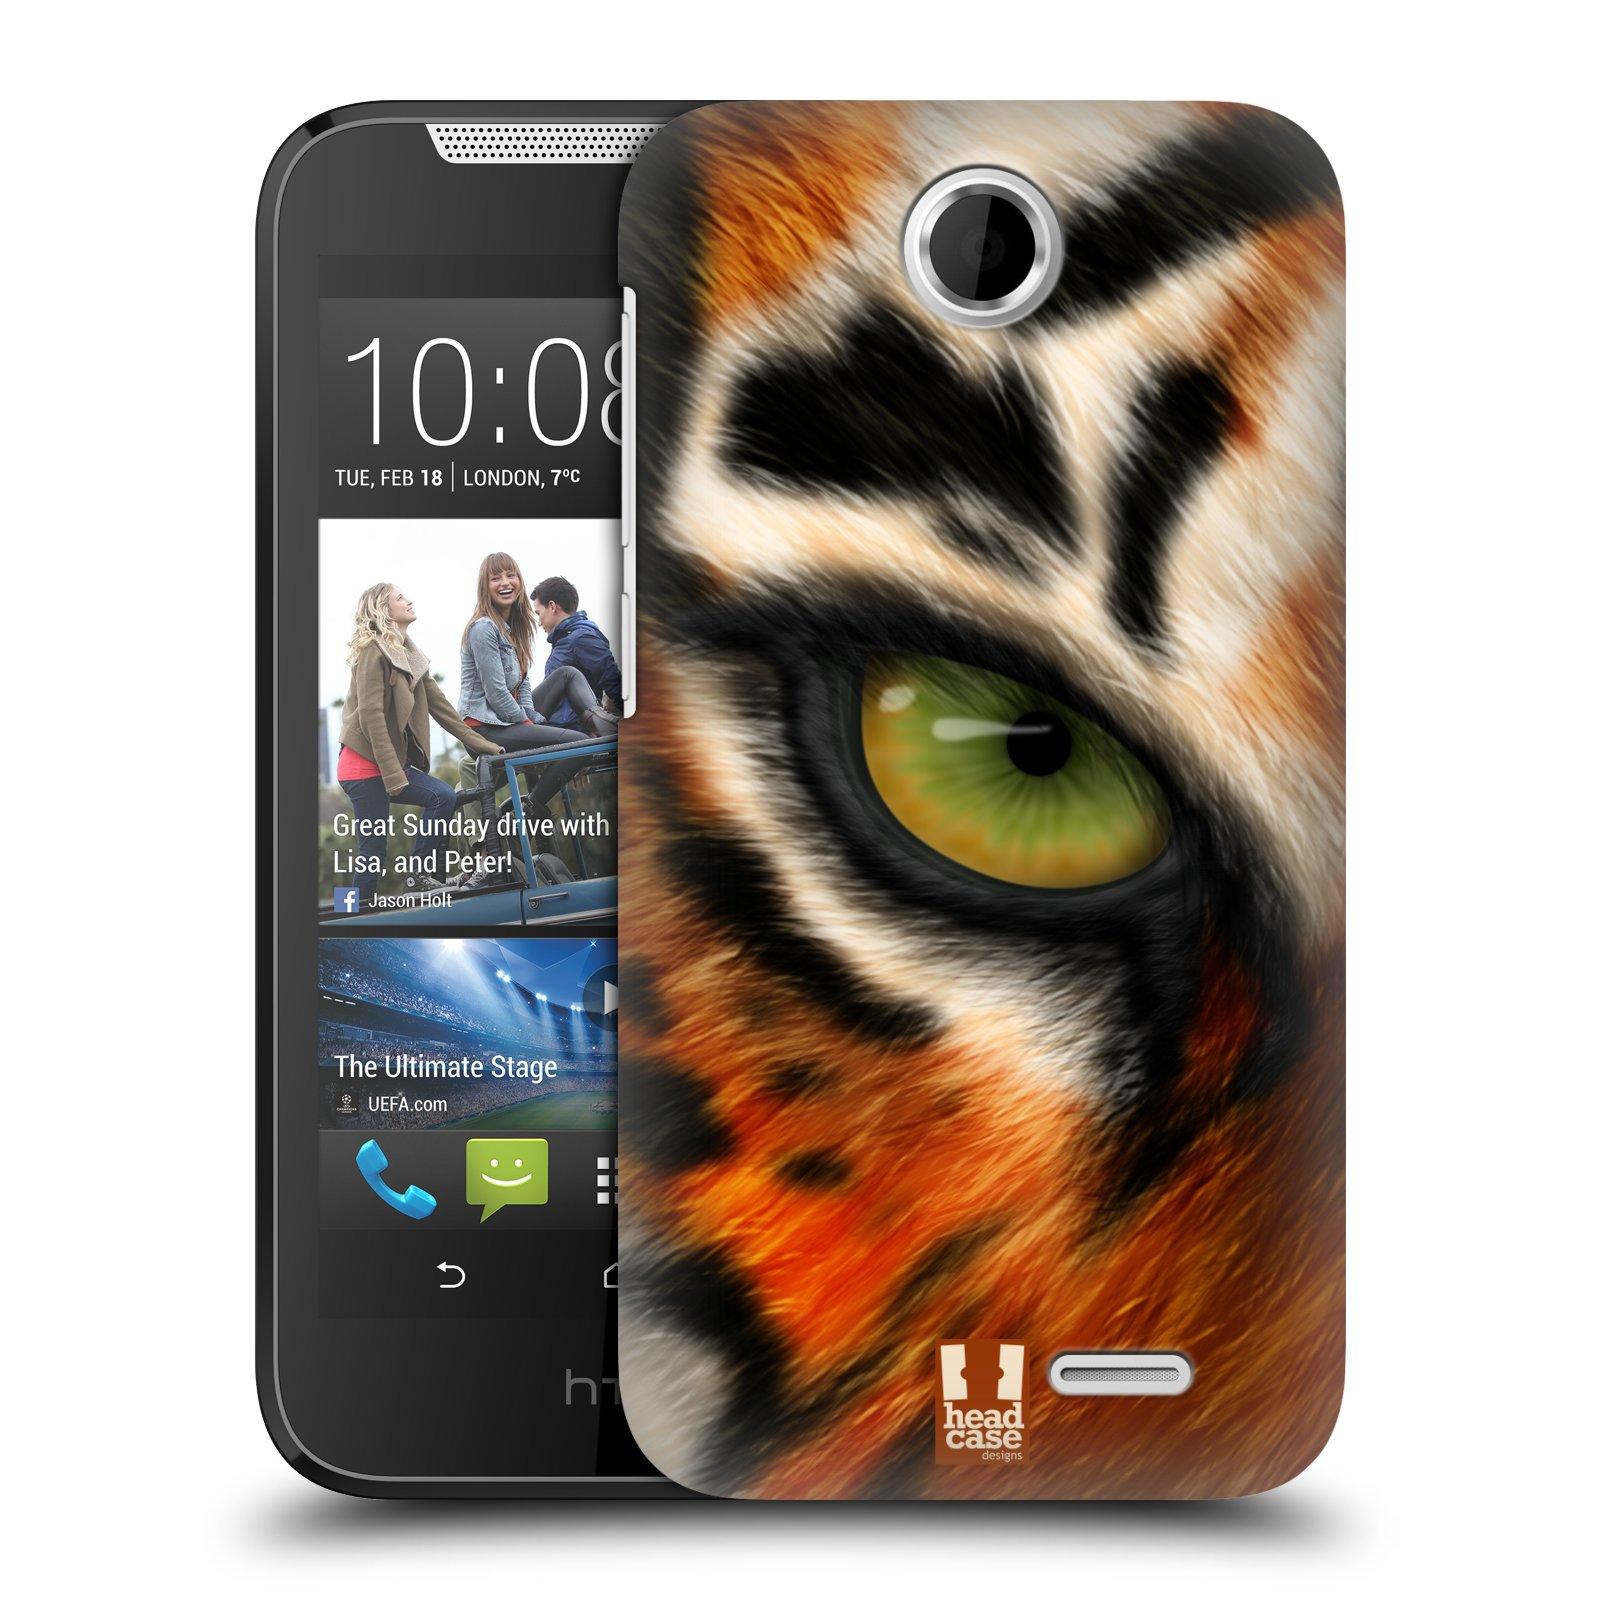 HEAD CASE plastový obal na mobil HTC Desire 310 vzor pohled zvířete oko tygr